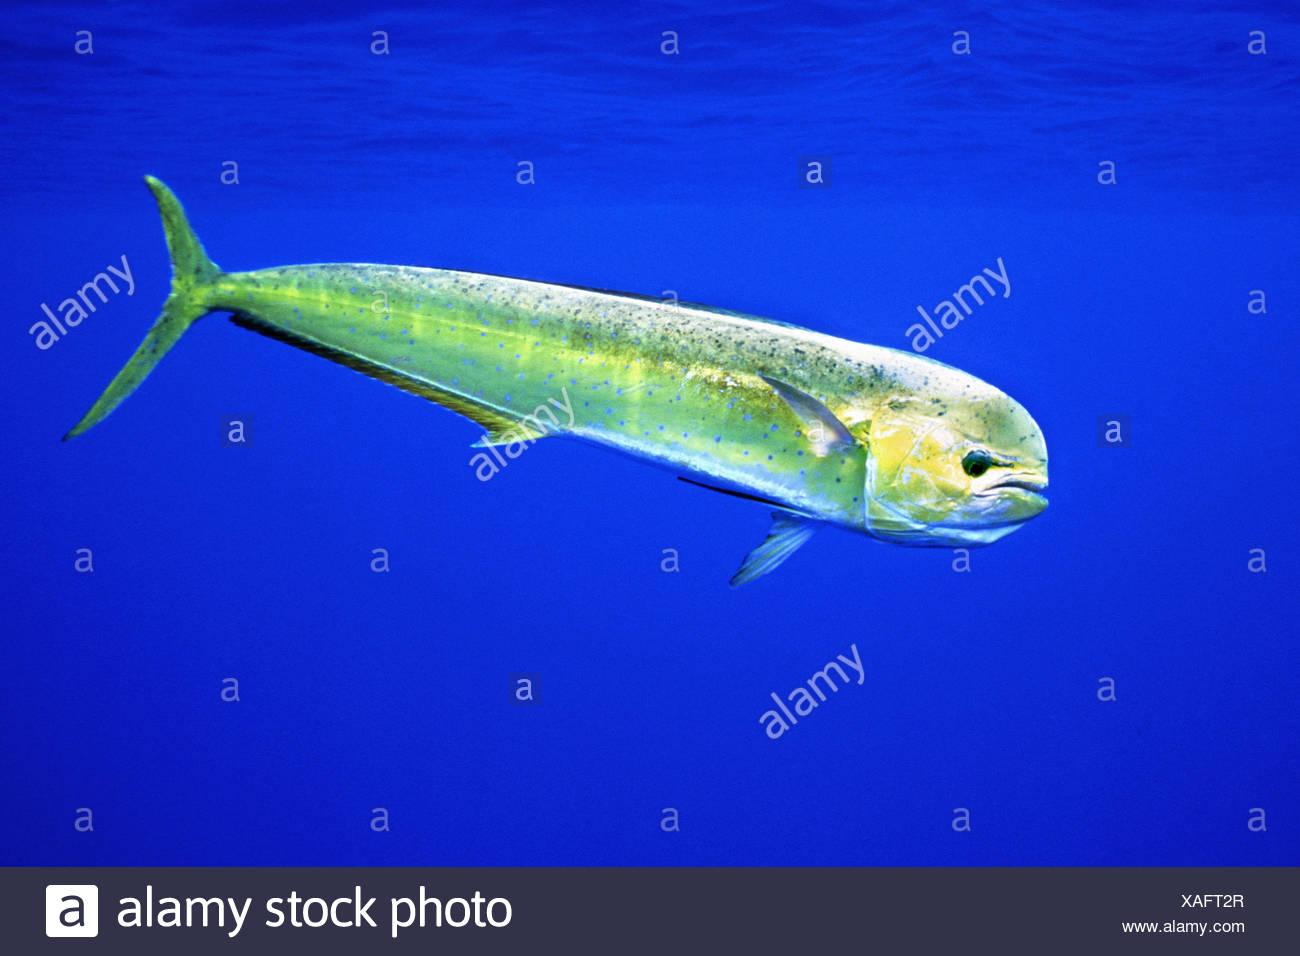 Mahi Mahi Dolphin Fish | Mahi Mahi Dolphin Fish Or Dorado Coryphaena Hippurus Female Kona